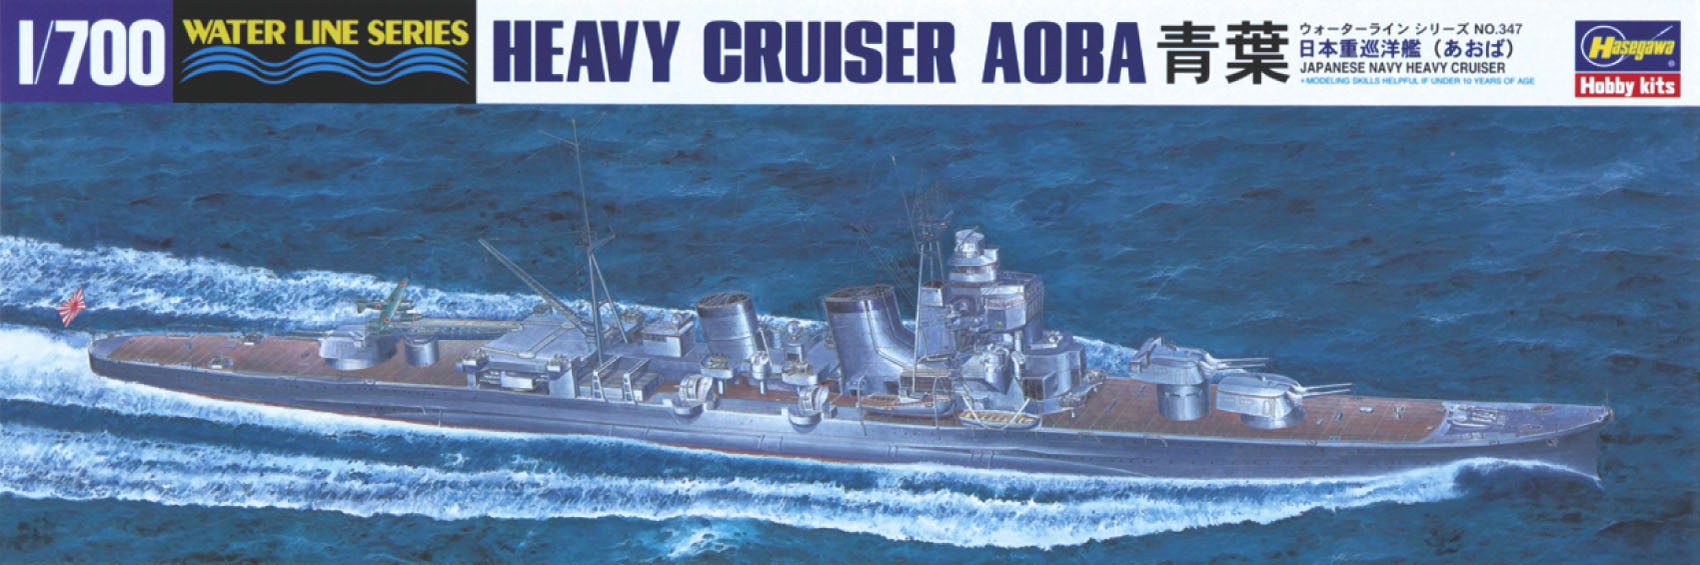 Hasegawa Ijn Heavy Cruiser Aoba